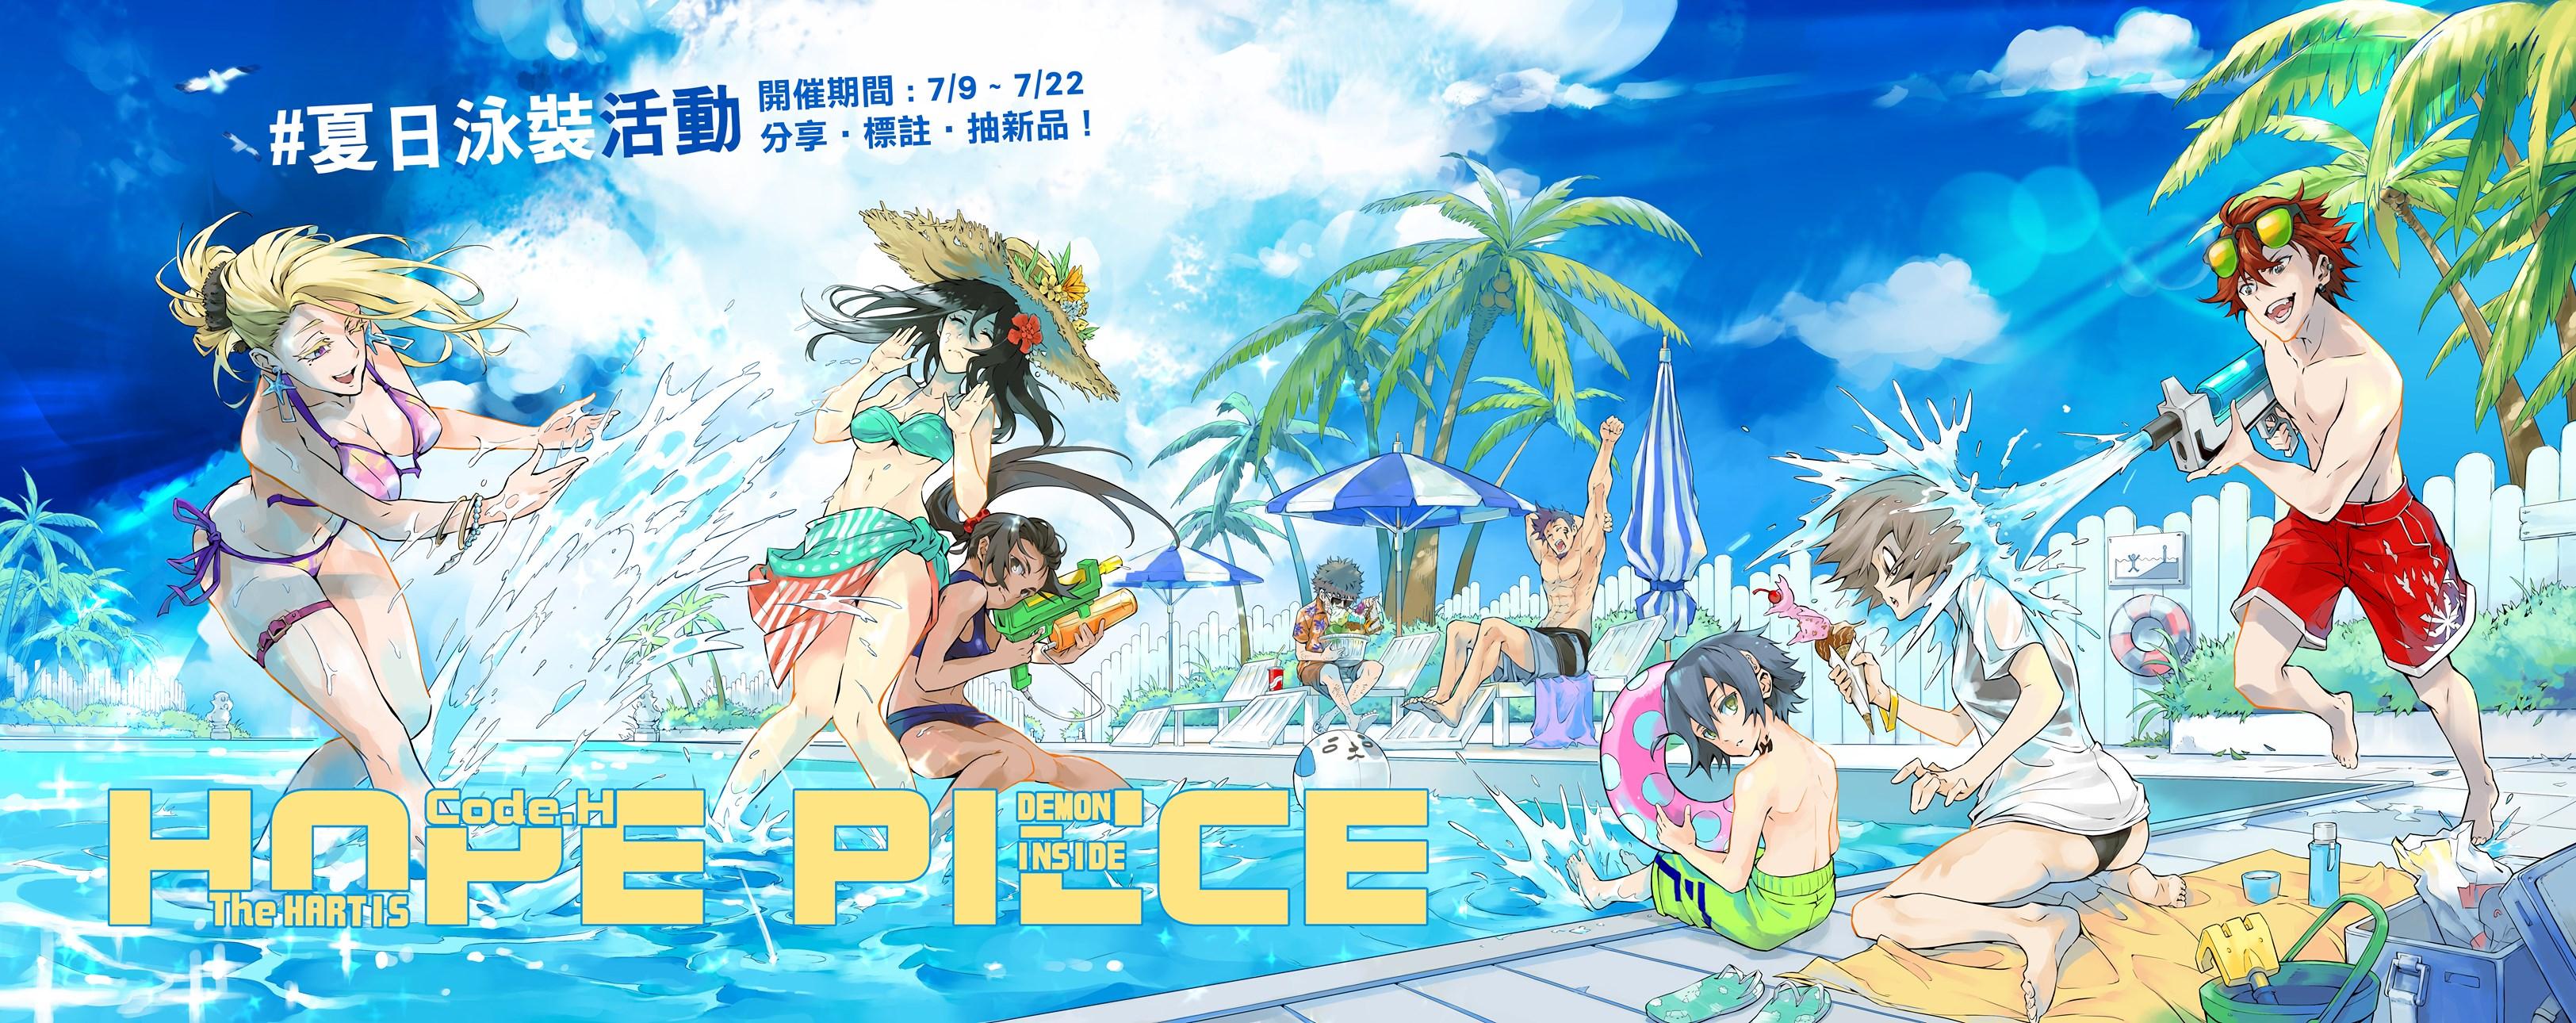 Hope Piece